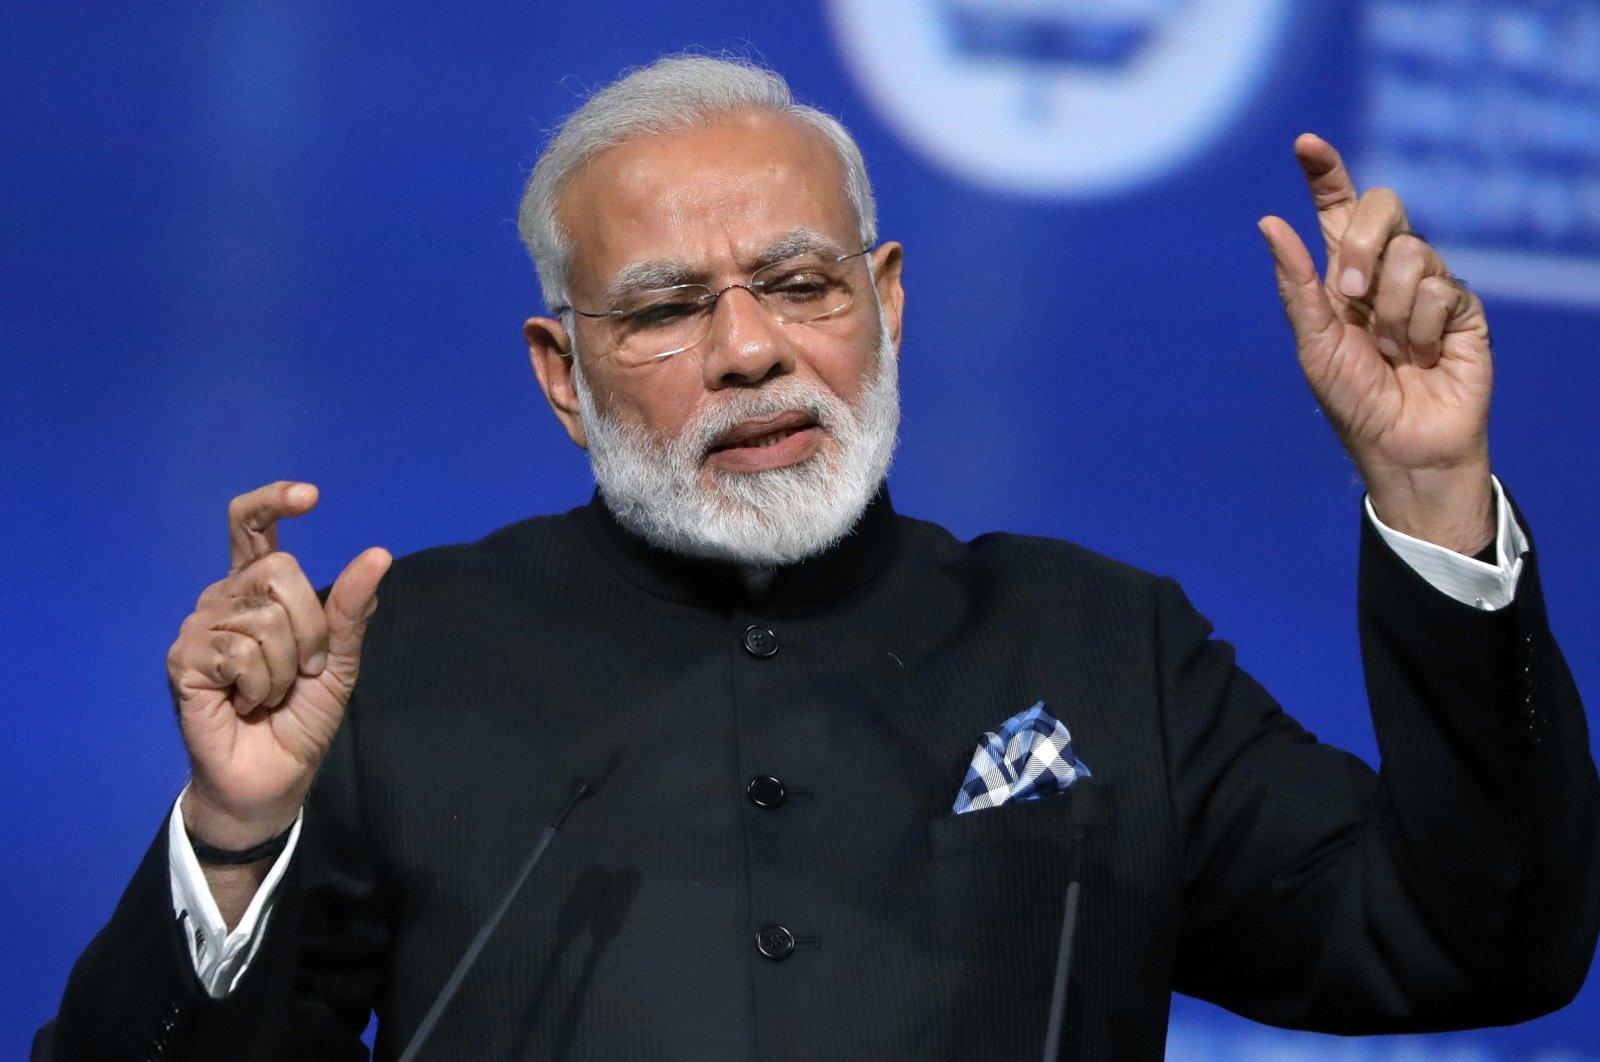 In this June 2, 2017, file photo Indian Prime Minister Narendra Modi speaks in St. Petersburg, Russia. (AP Photo)